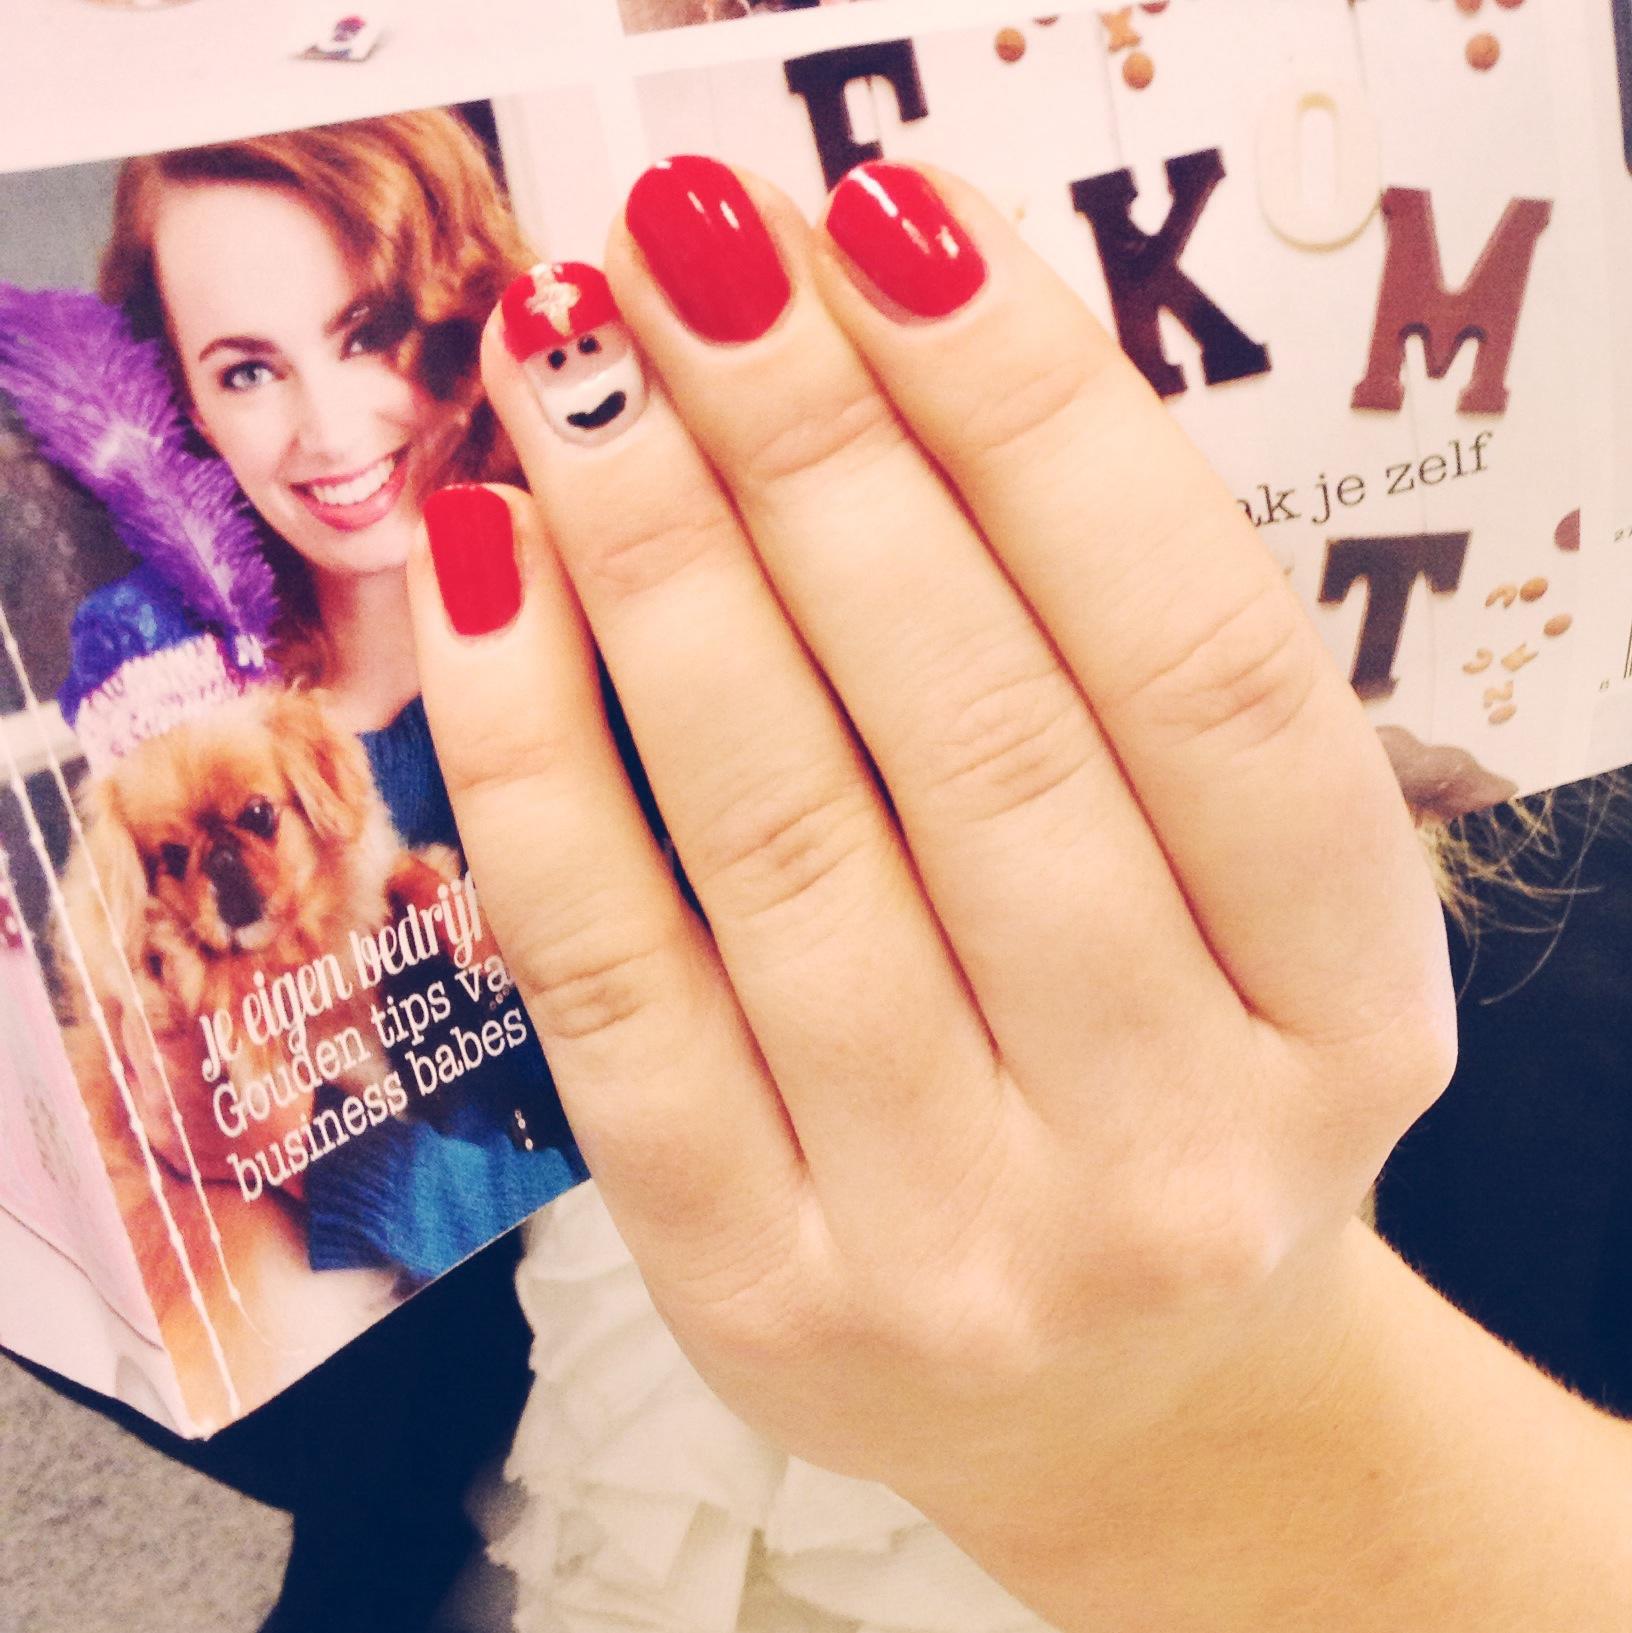 Vreemde beautytrend: 'Succulent nails'!